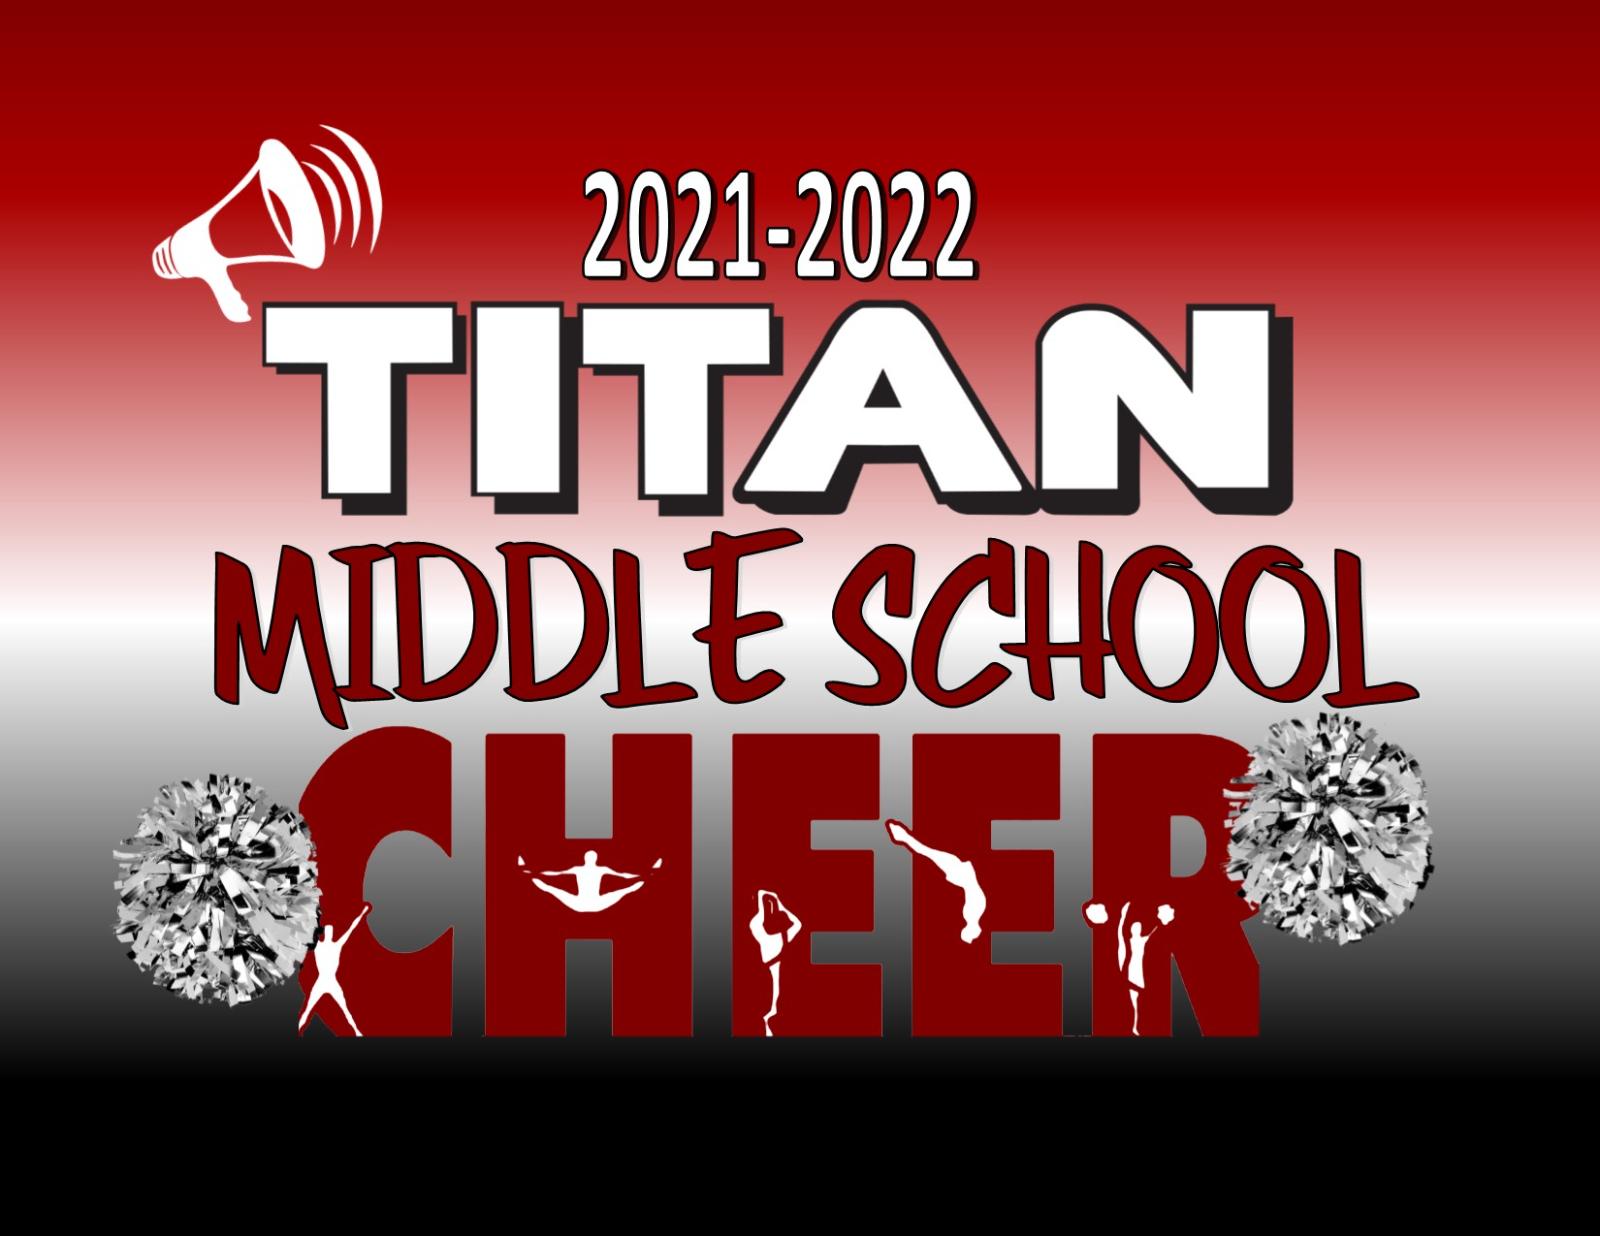 ANNOUNCING THE 2021 TITAN MIDDLE SCHOOL CHEERLEADERS